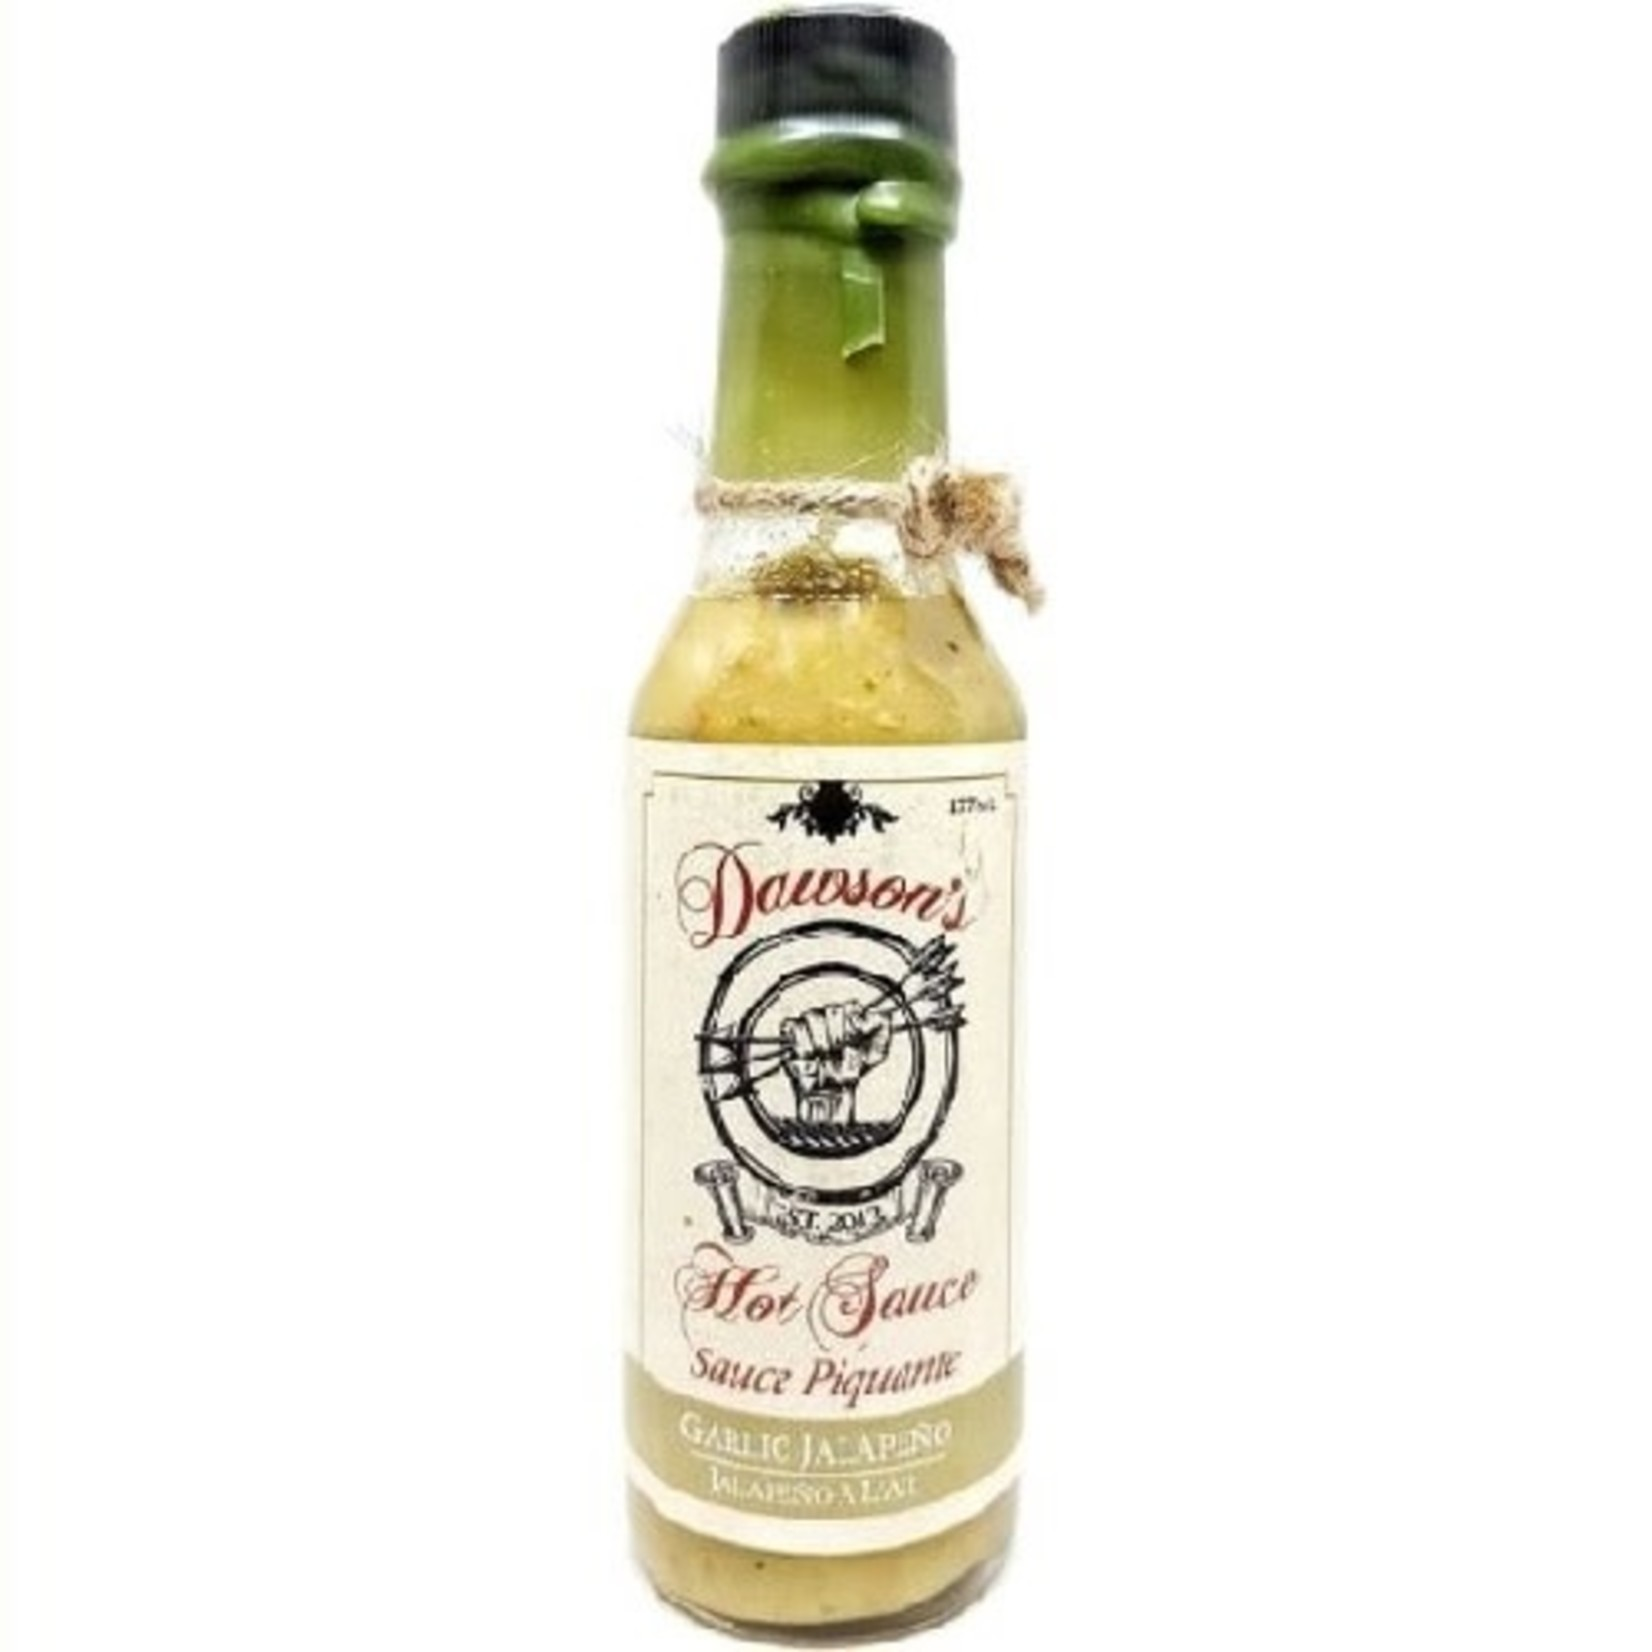 Sarafino Inc. Garlic Jalapeno Hot Sauce 155ml